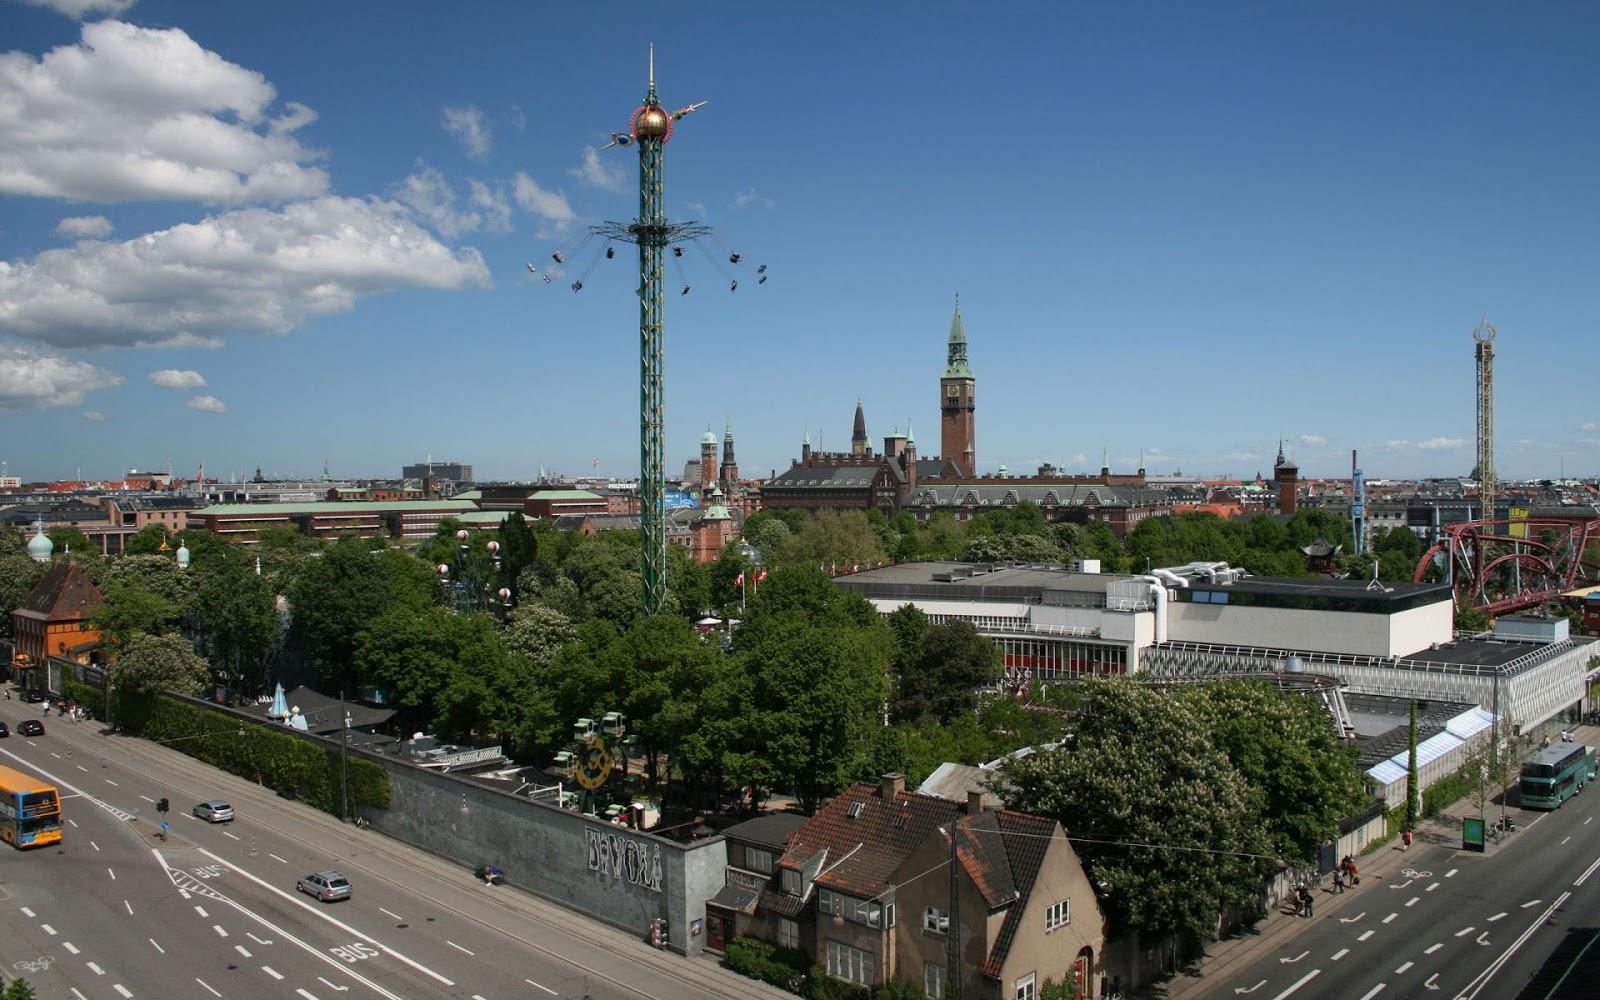 Tivoli Gardens Copenhagen